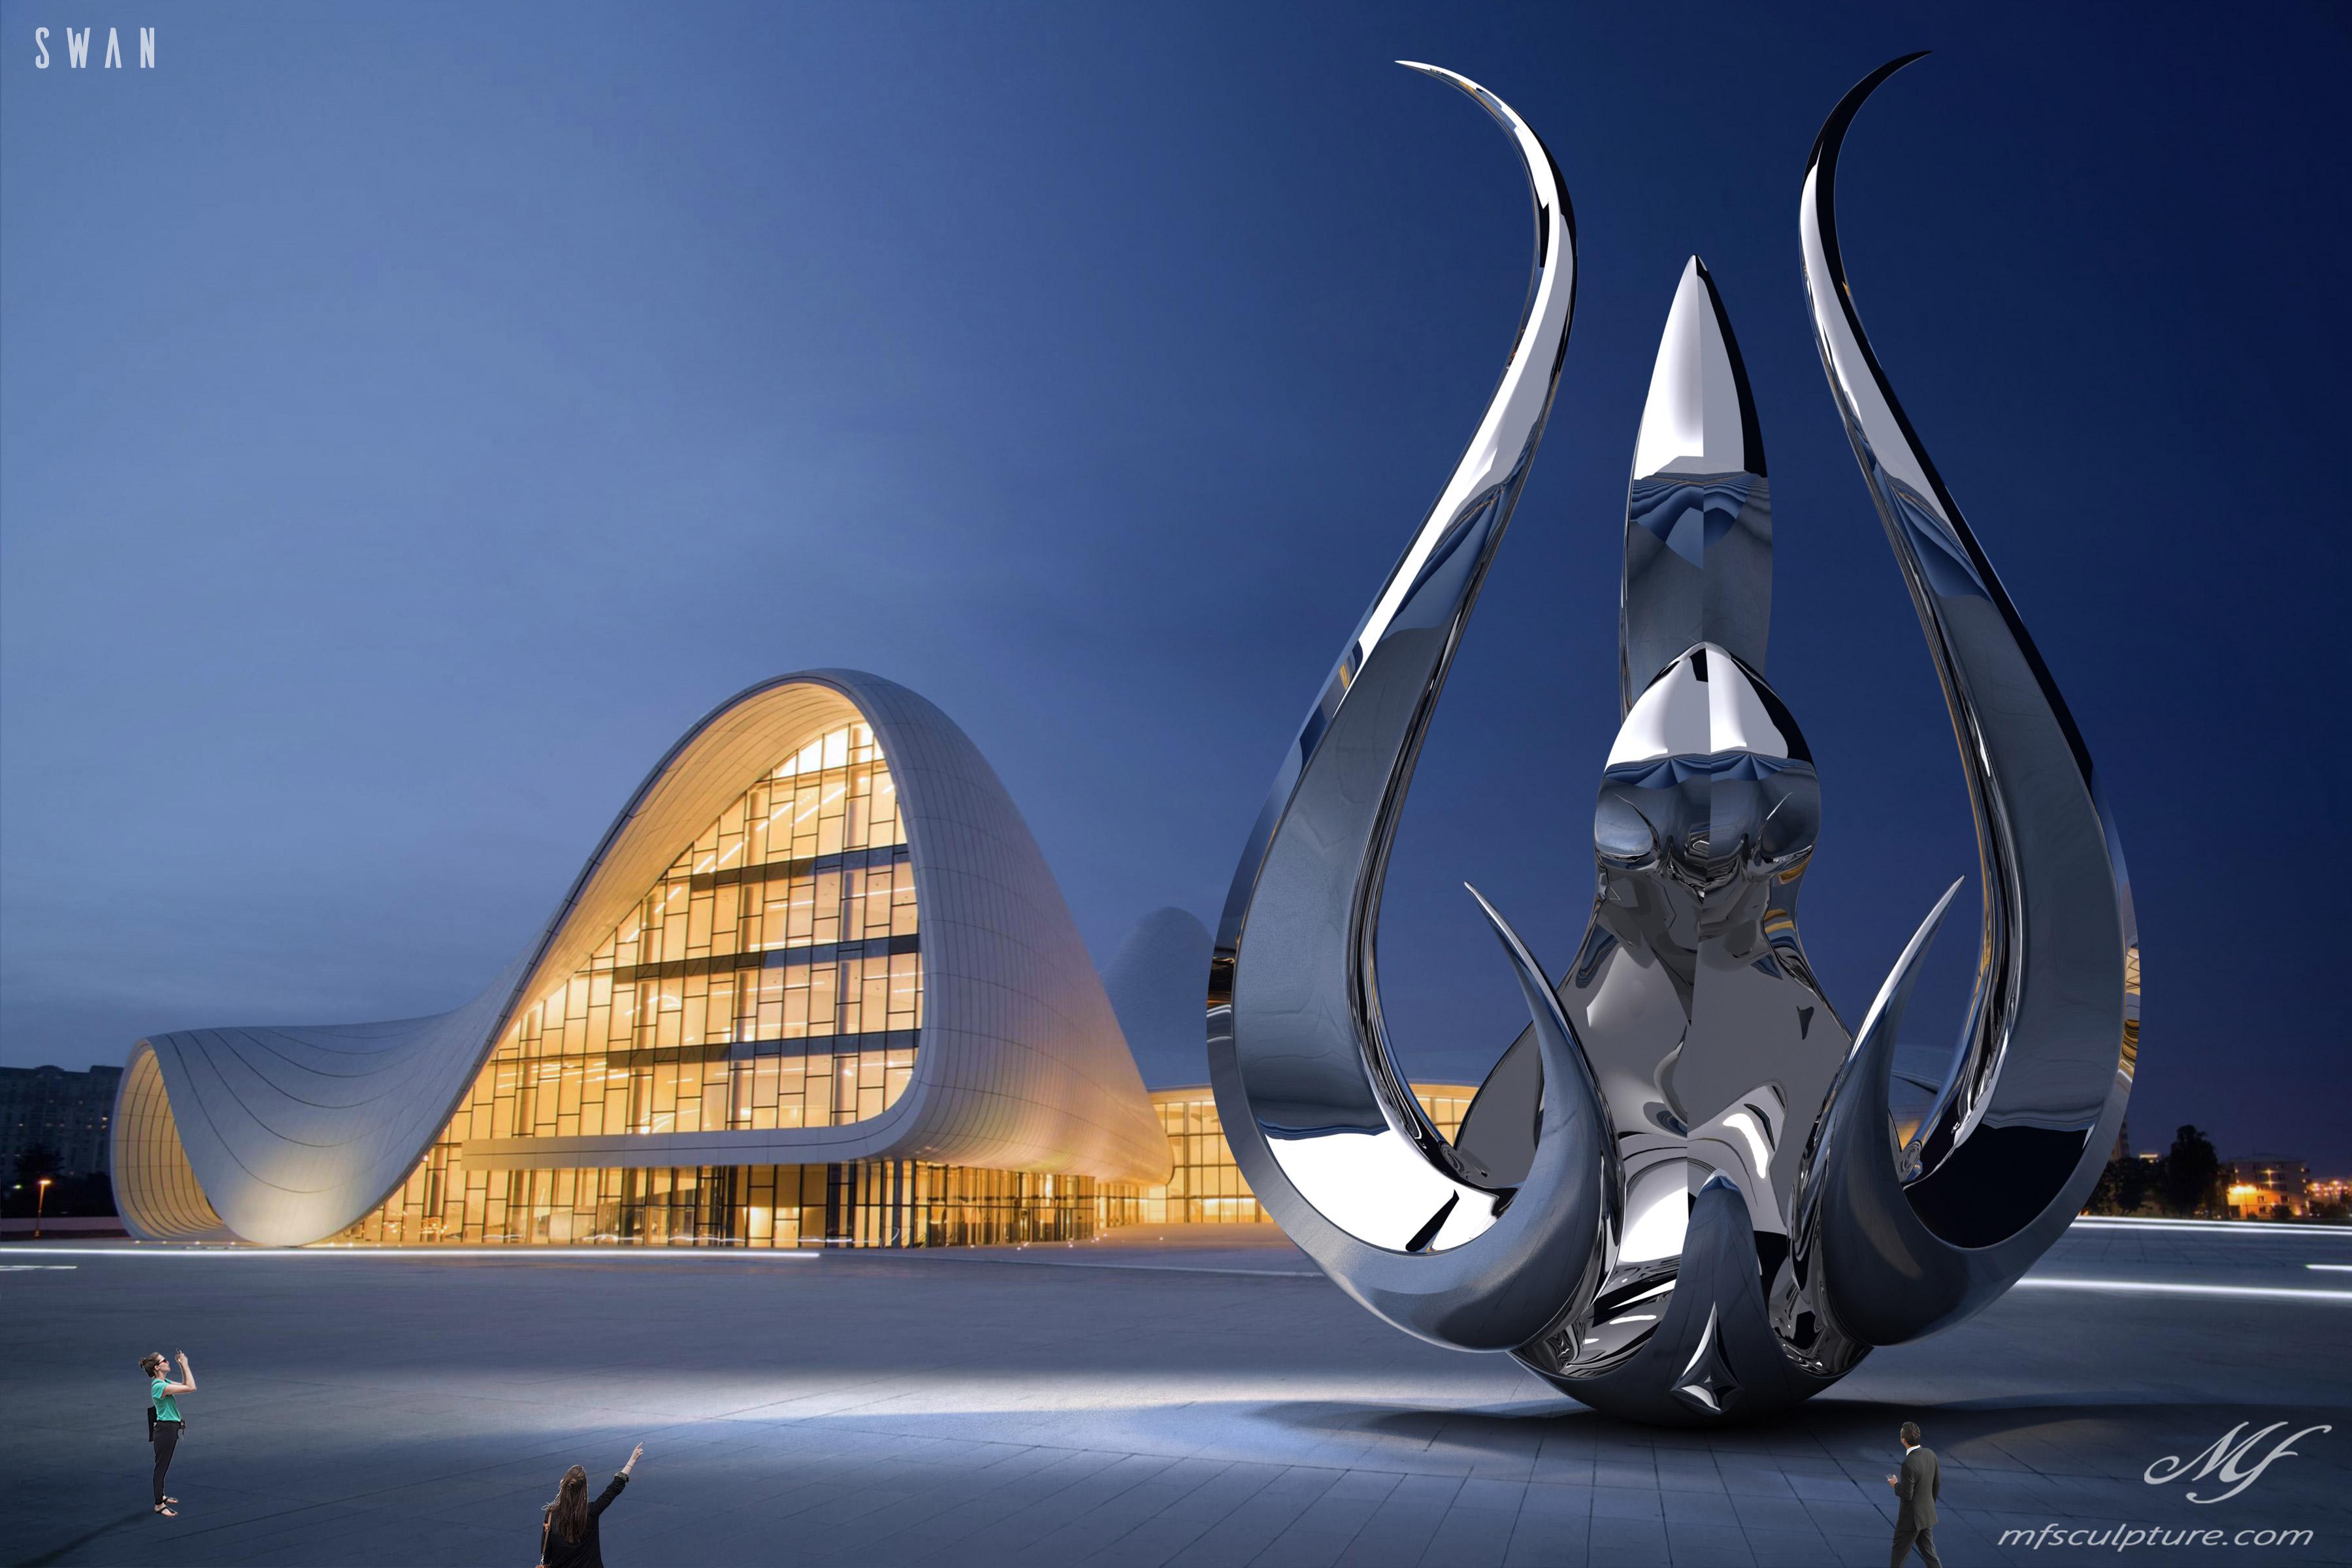 Heydar Aliyev Zaha Hadid Convergence Modern Sculpture Public Art Swan Contemporary 7